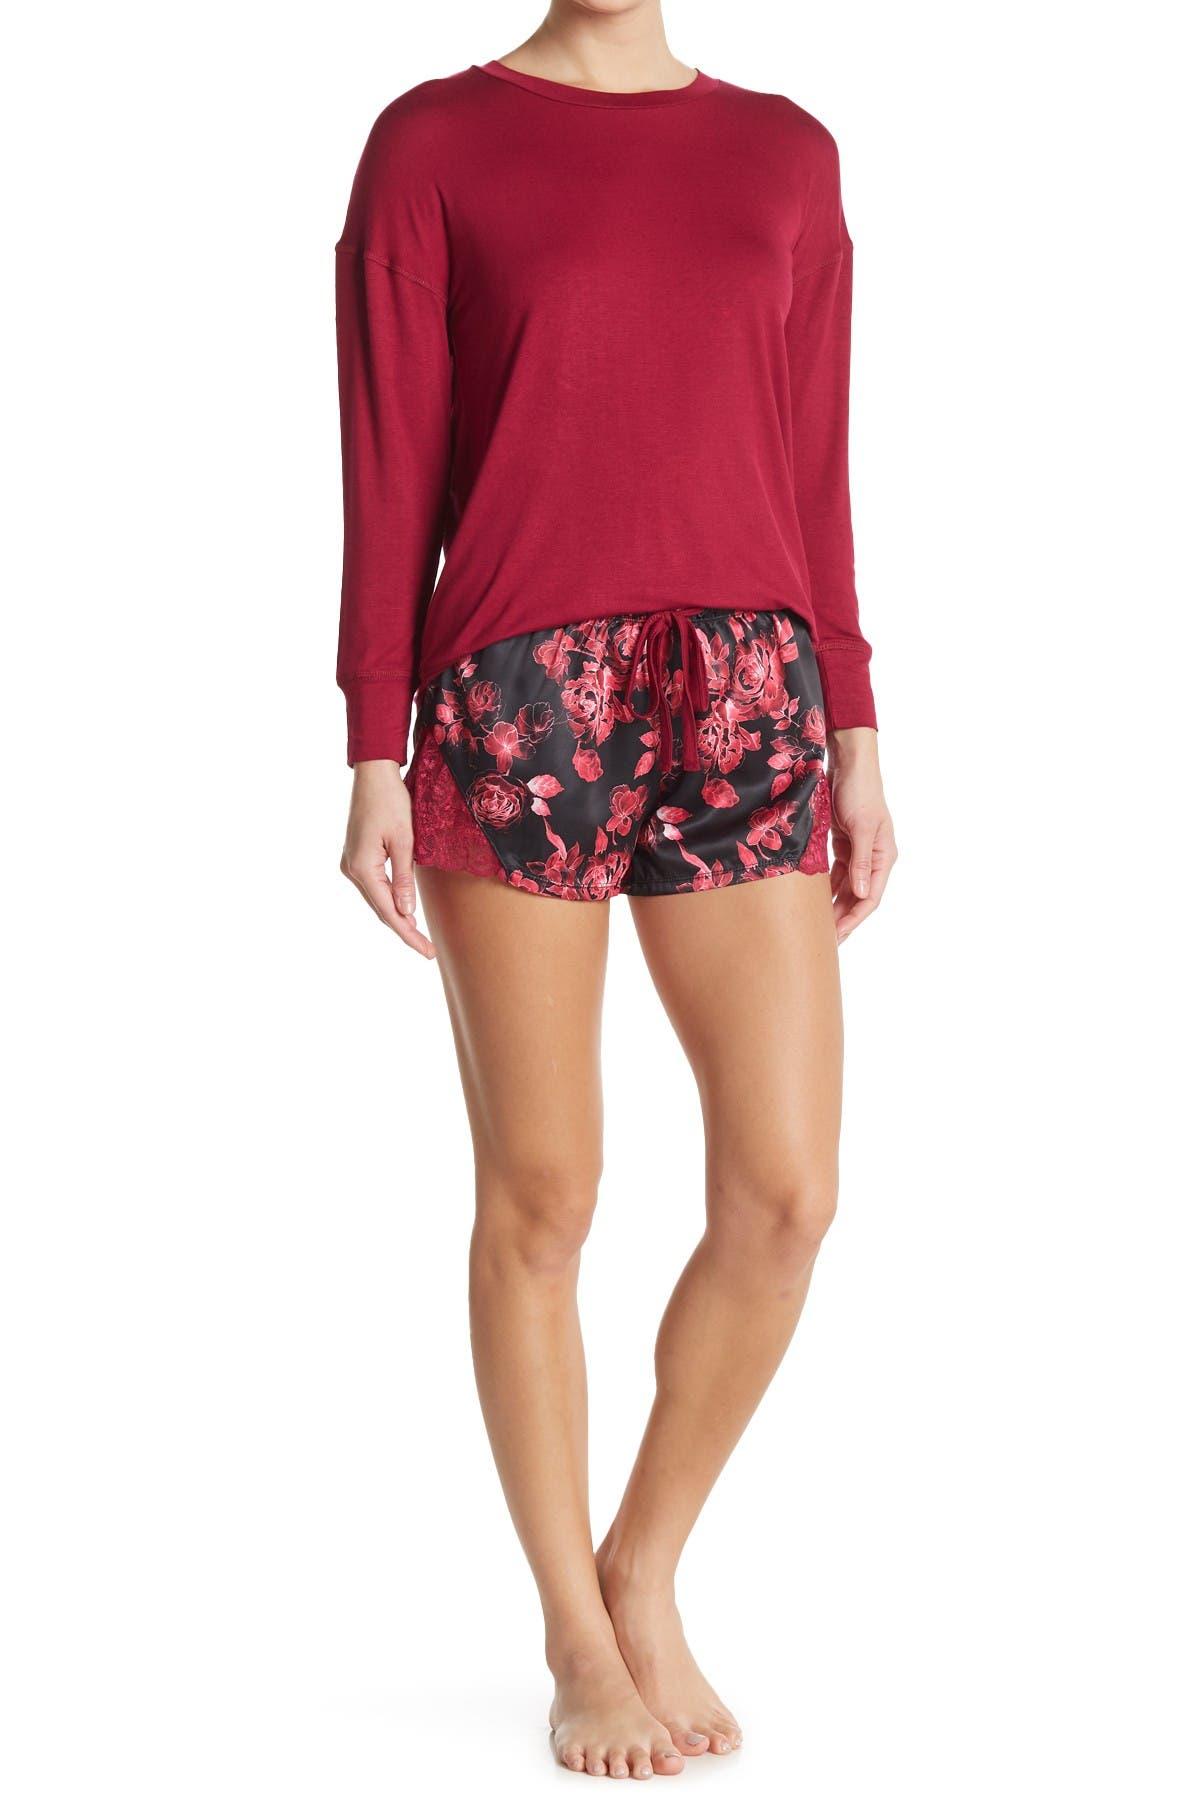 Catherine Malandrino Rose Garden Long Sleeve Top & Shorts 2-Piece Pajama Set